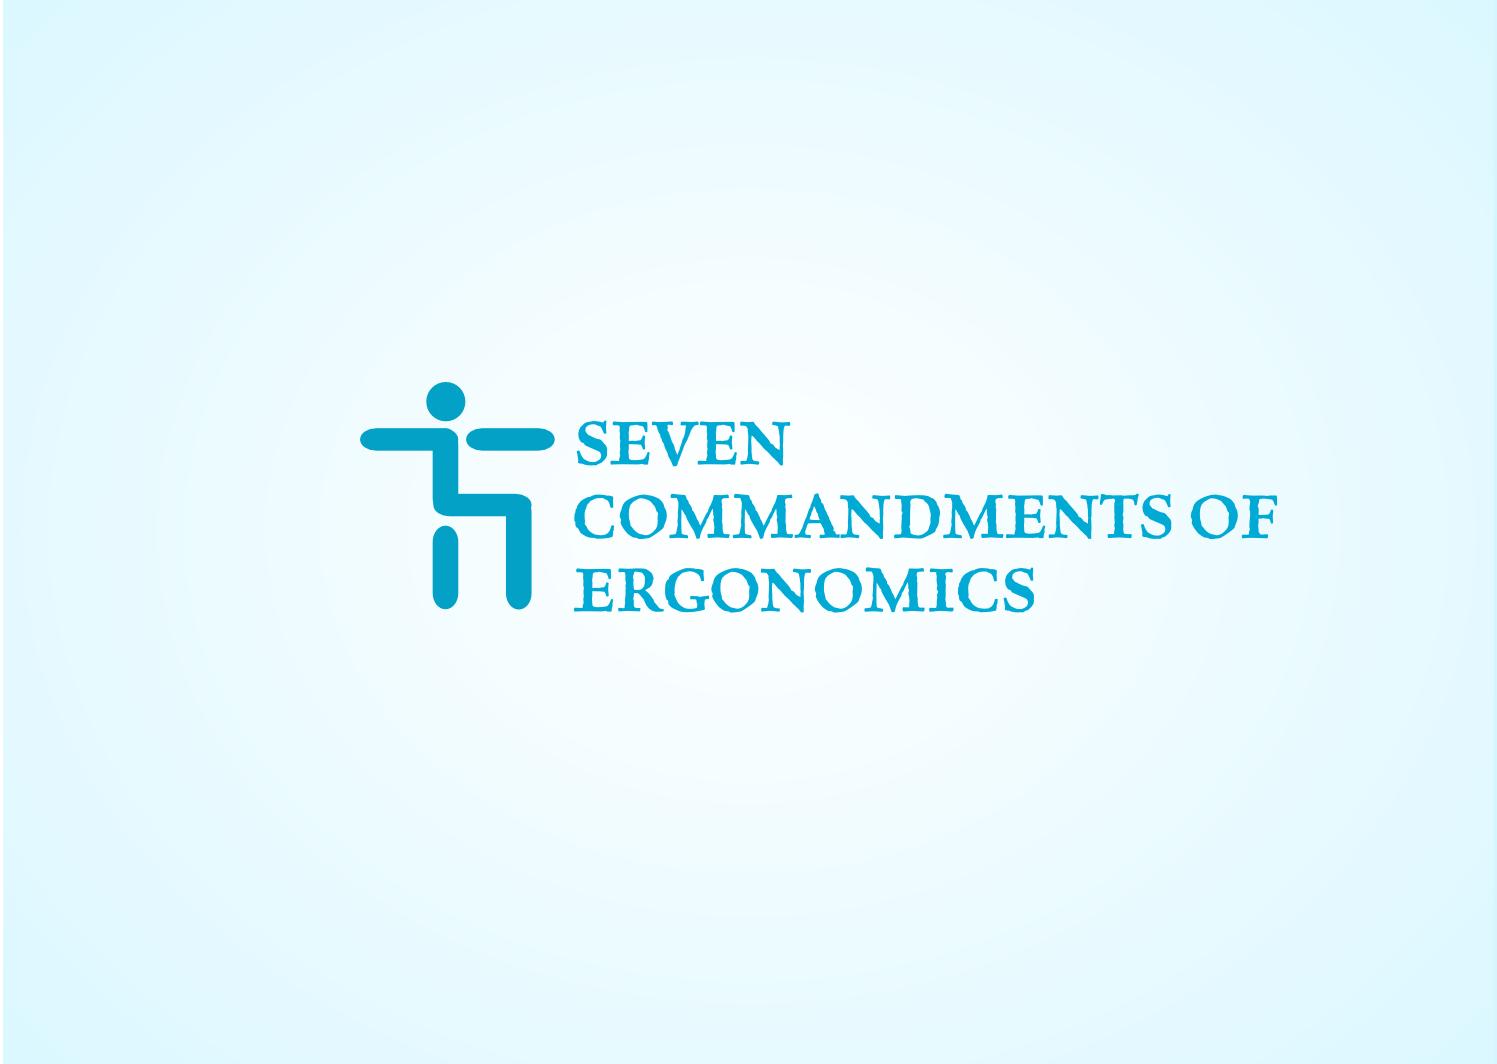 Logo Design by Joseph calunsag Cagaanan - Entry No. 115 in the Logo Design Contest Logo Design for Seven Commandments of Ergonomics.